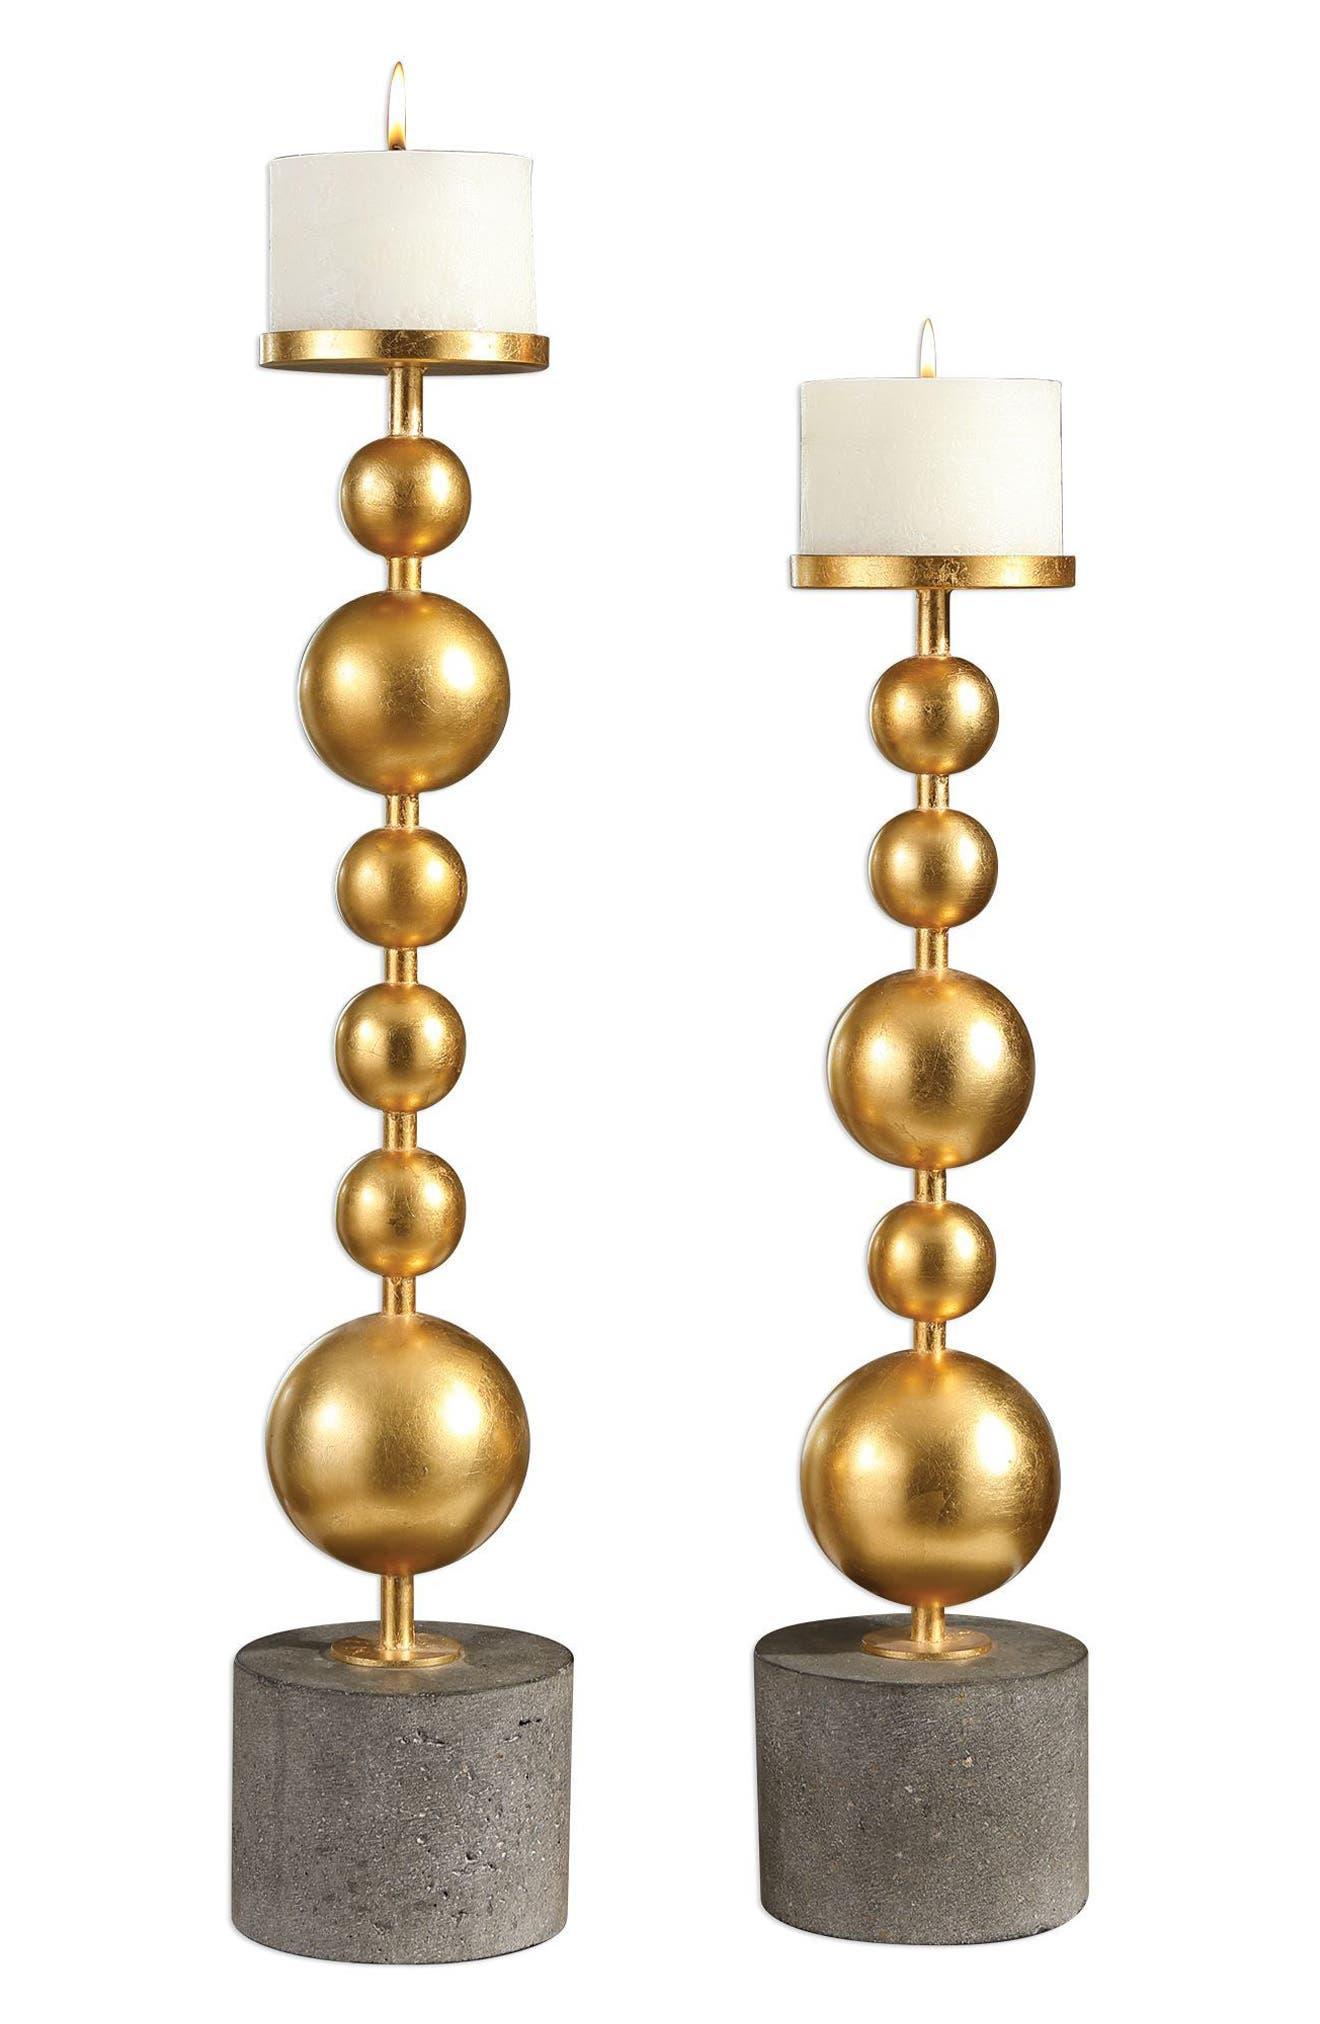 Selim Set of 2 Candleholders,                         Main,                         color, Metallic Gold